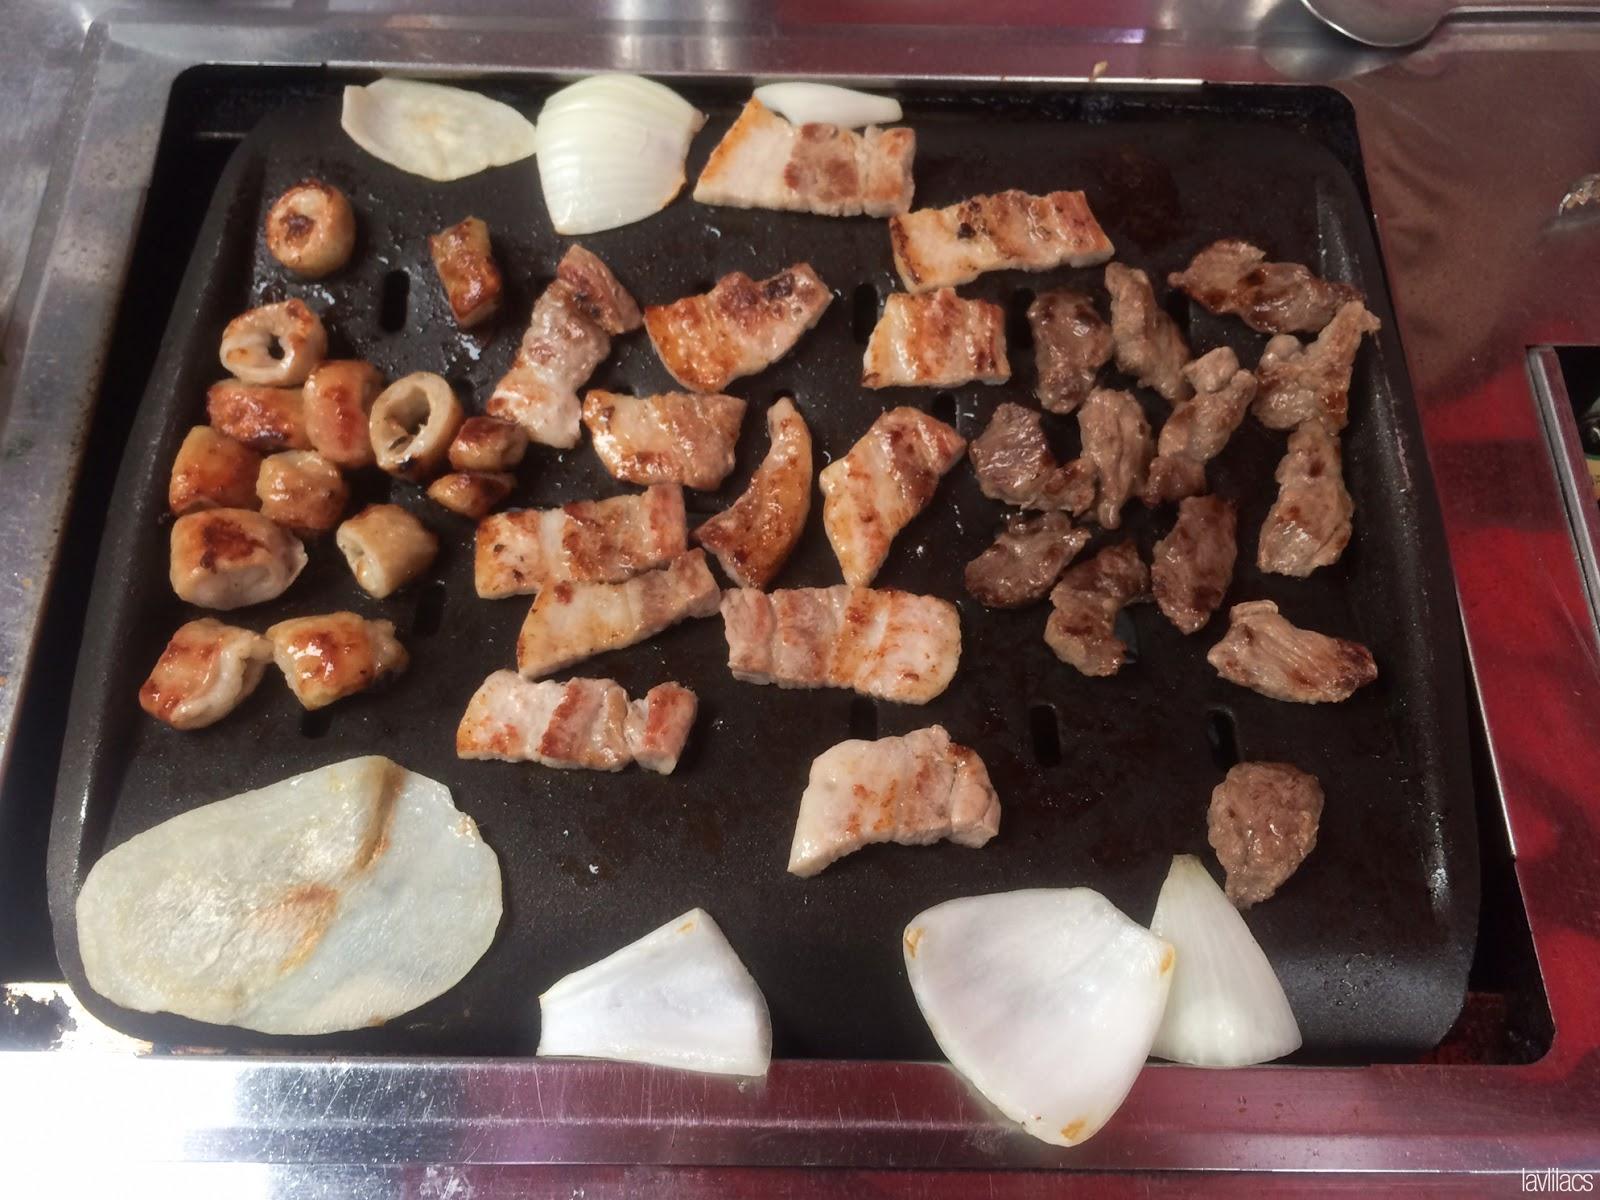 Seoul, Korea - Summer Study Abroad 2014 - Gangnam The Mak Chang 막창 - KBBQ Restaurant - Grilling pork intestine, pork belly, and beef